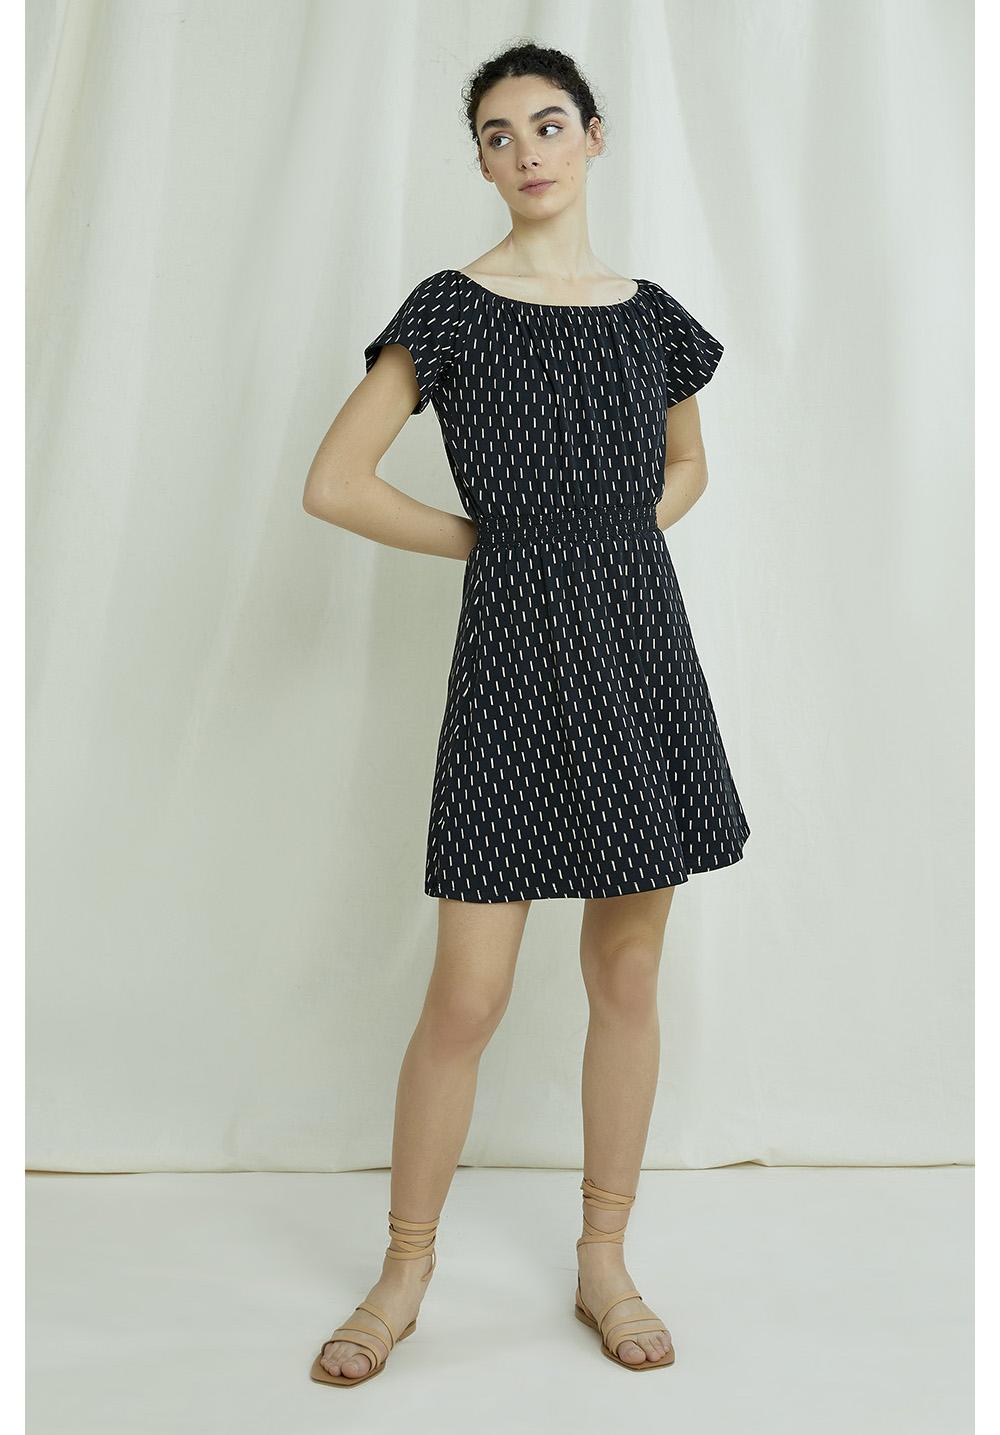 Ingrid Ikat Print Dress